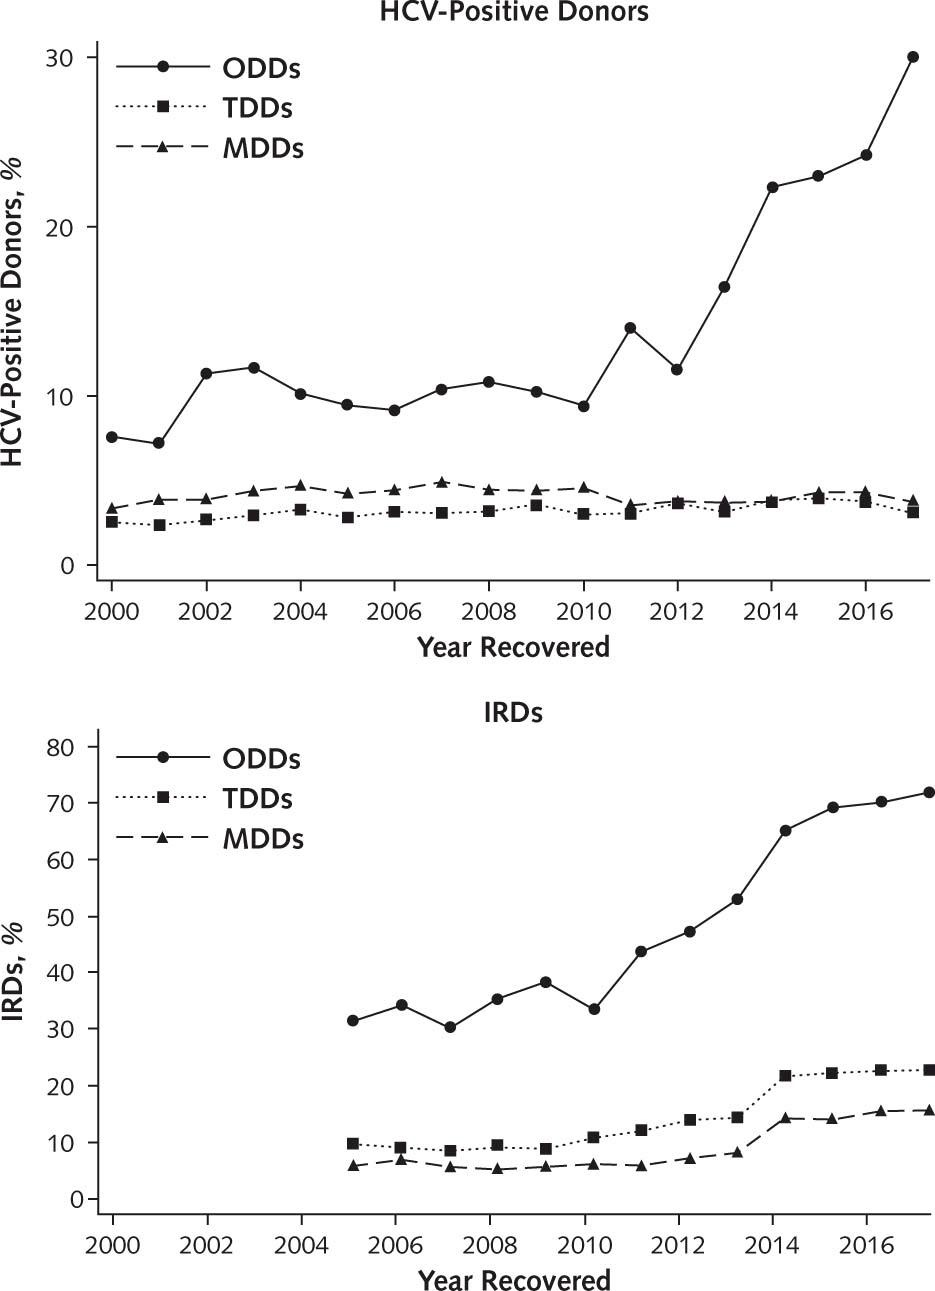 Figure 3. Durand C, et al. Ann Intern Med 2018